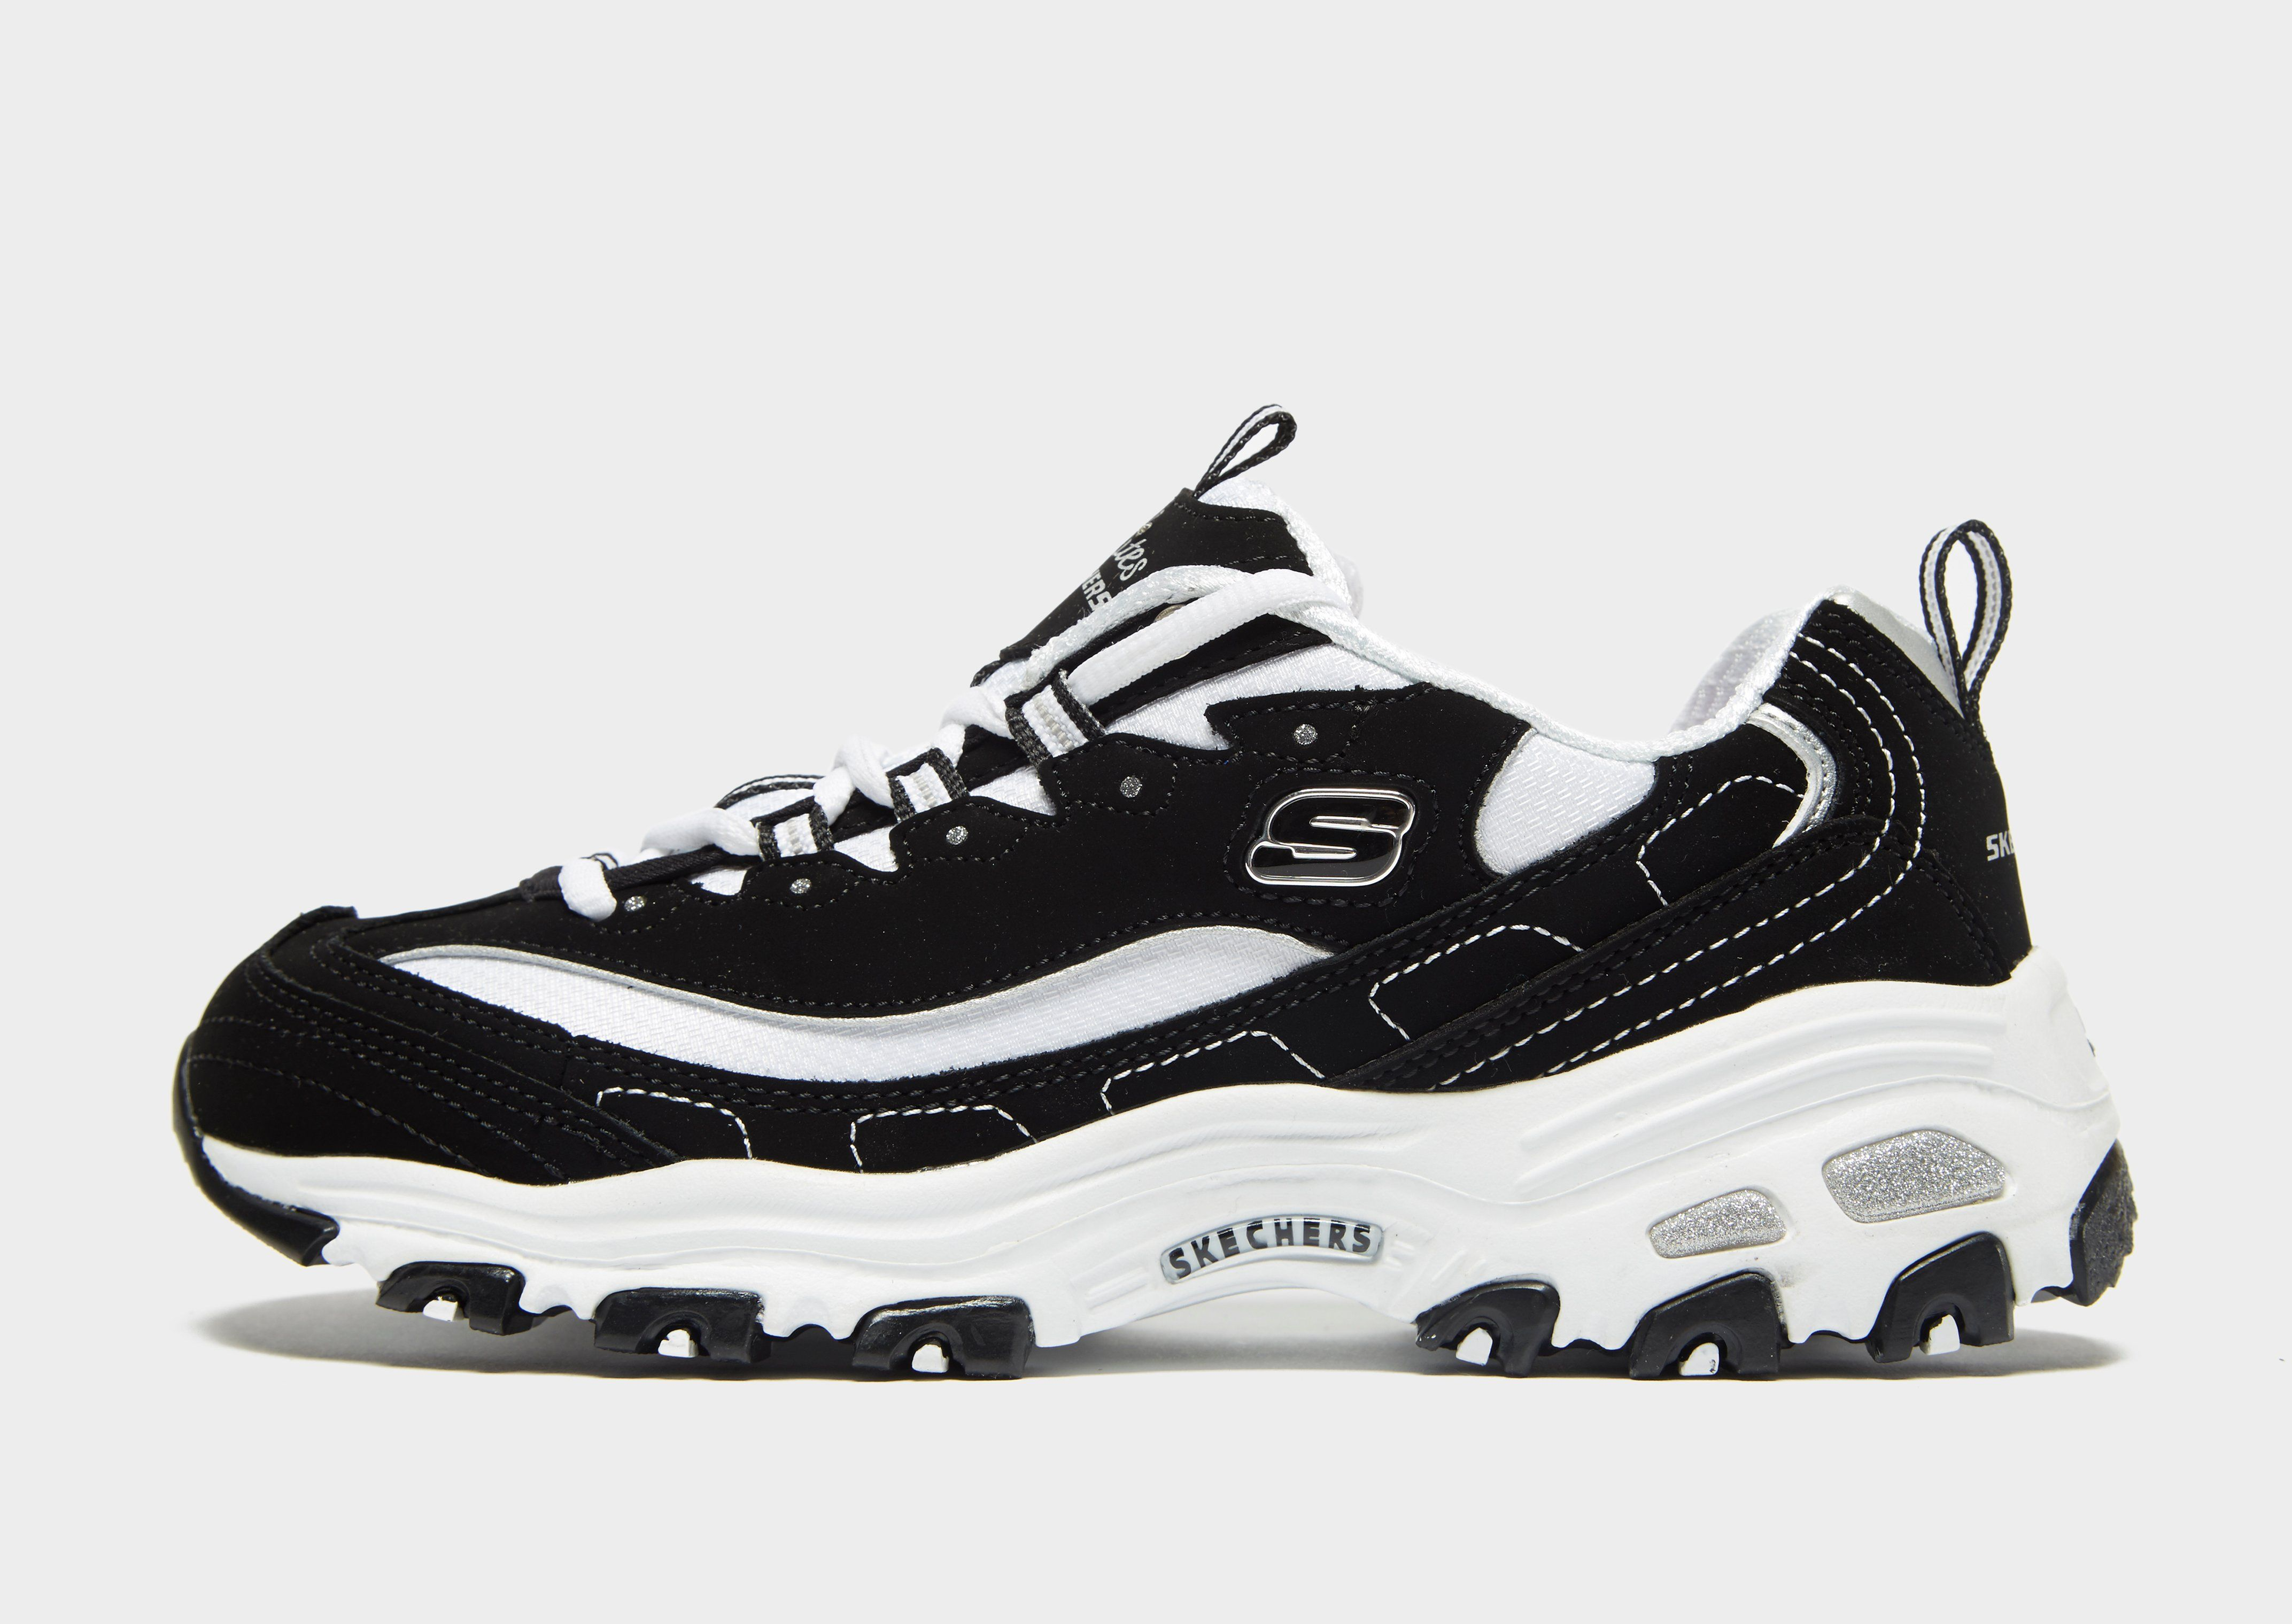 Skechers Black Athletic Shoes Skechers D'Lites for Women for